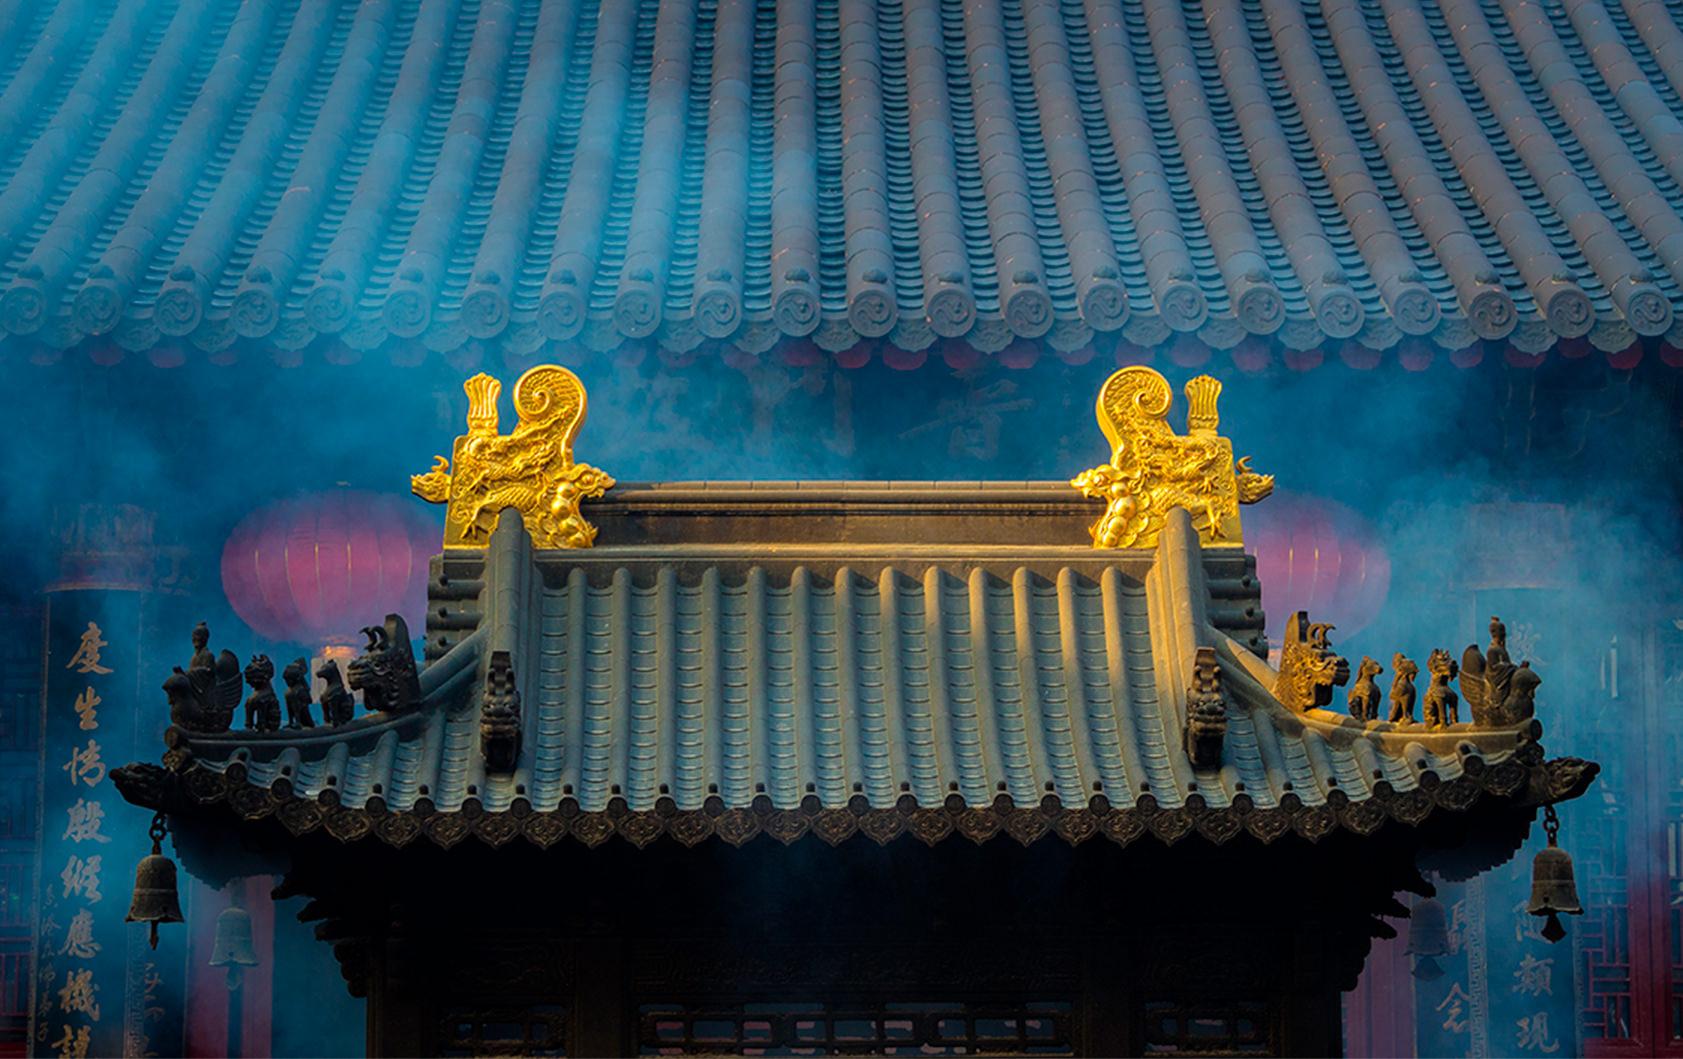 Tourisme Chine France touristes chinois promotion